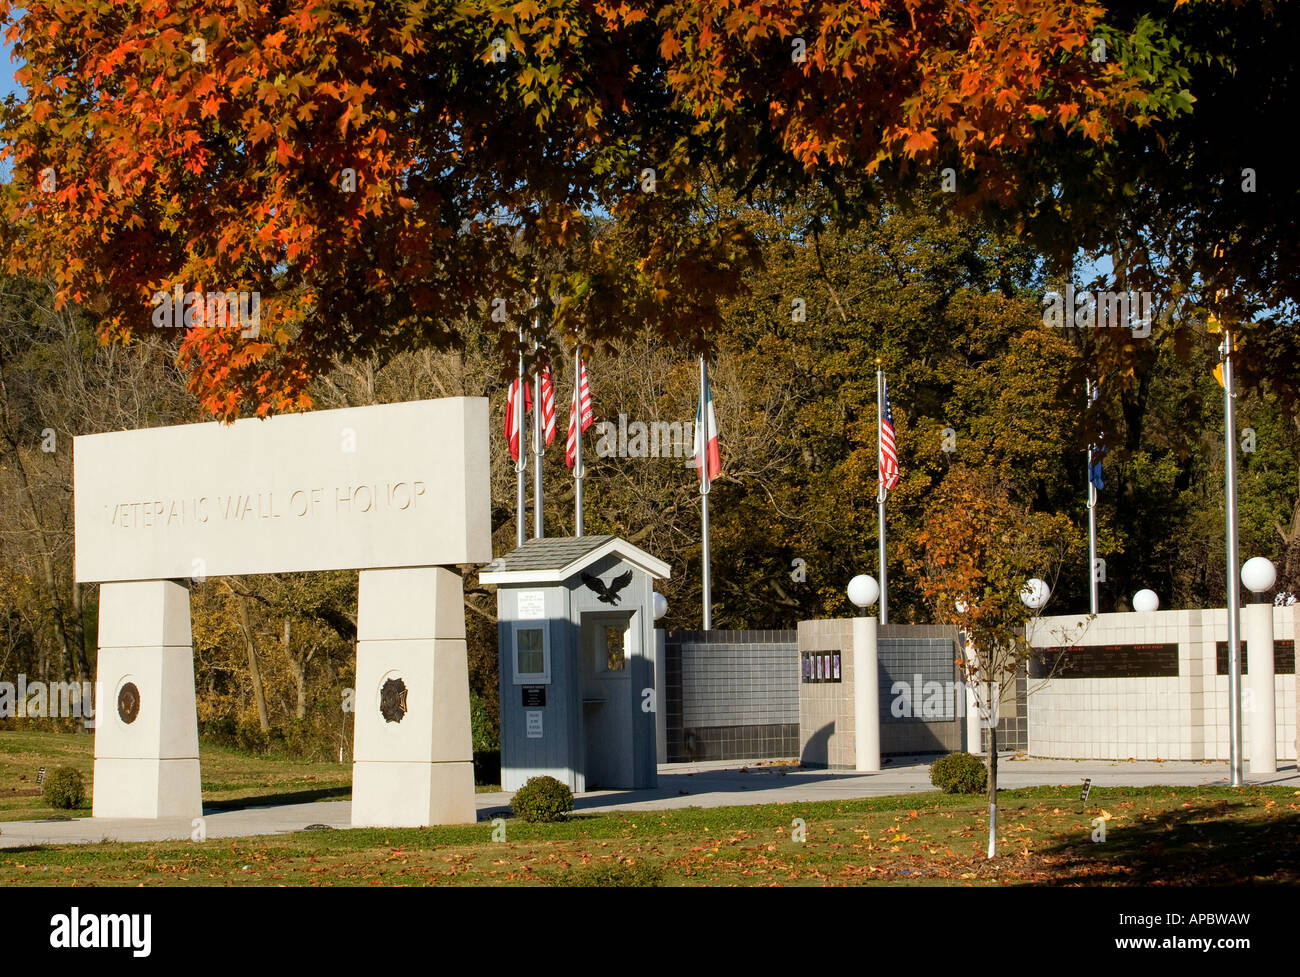 The Veterans Wall of Honor in Bella Vista, Ark. - Stock Image